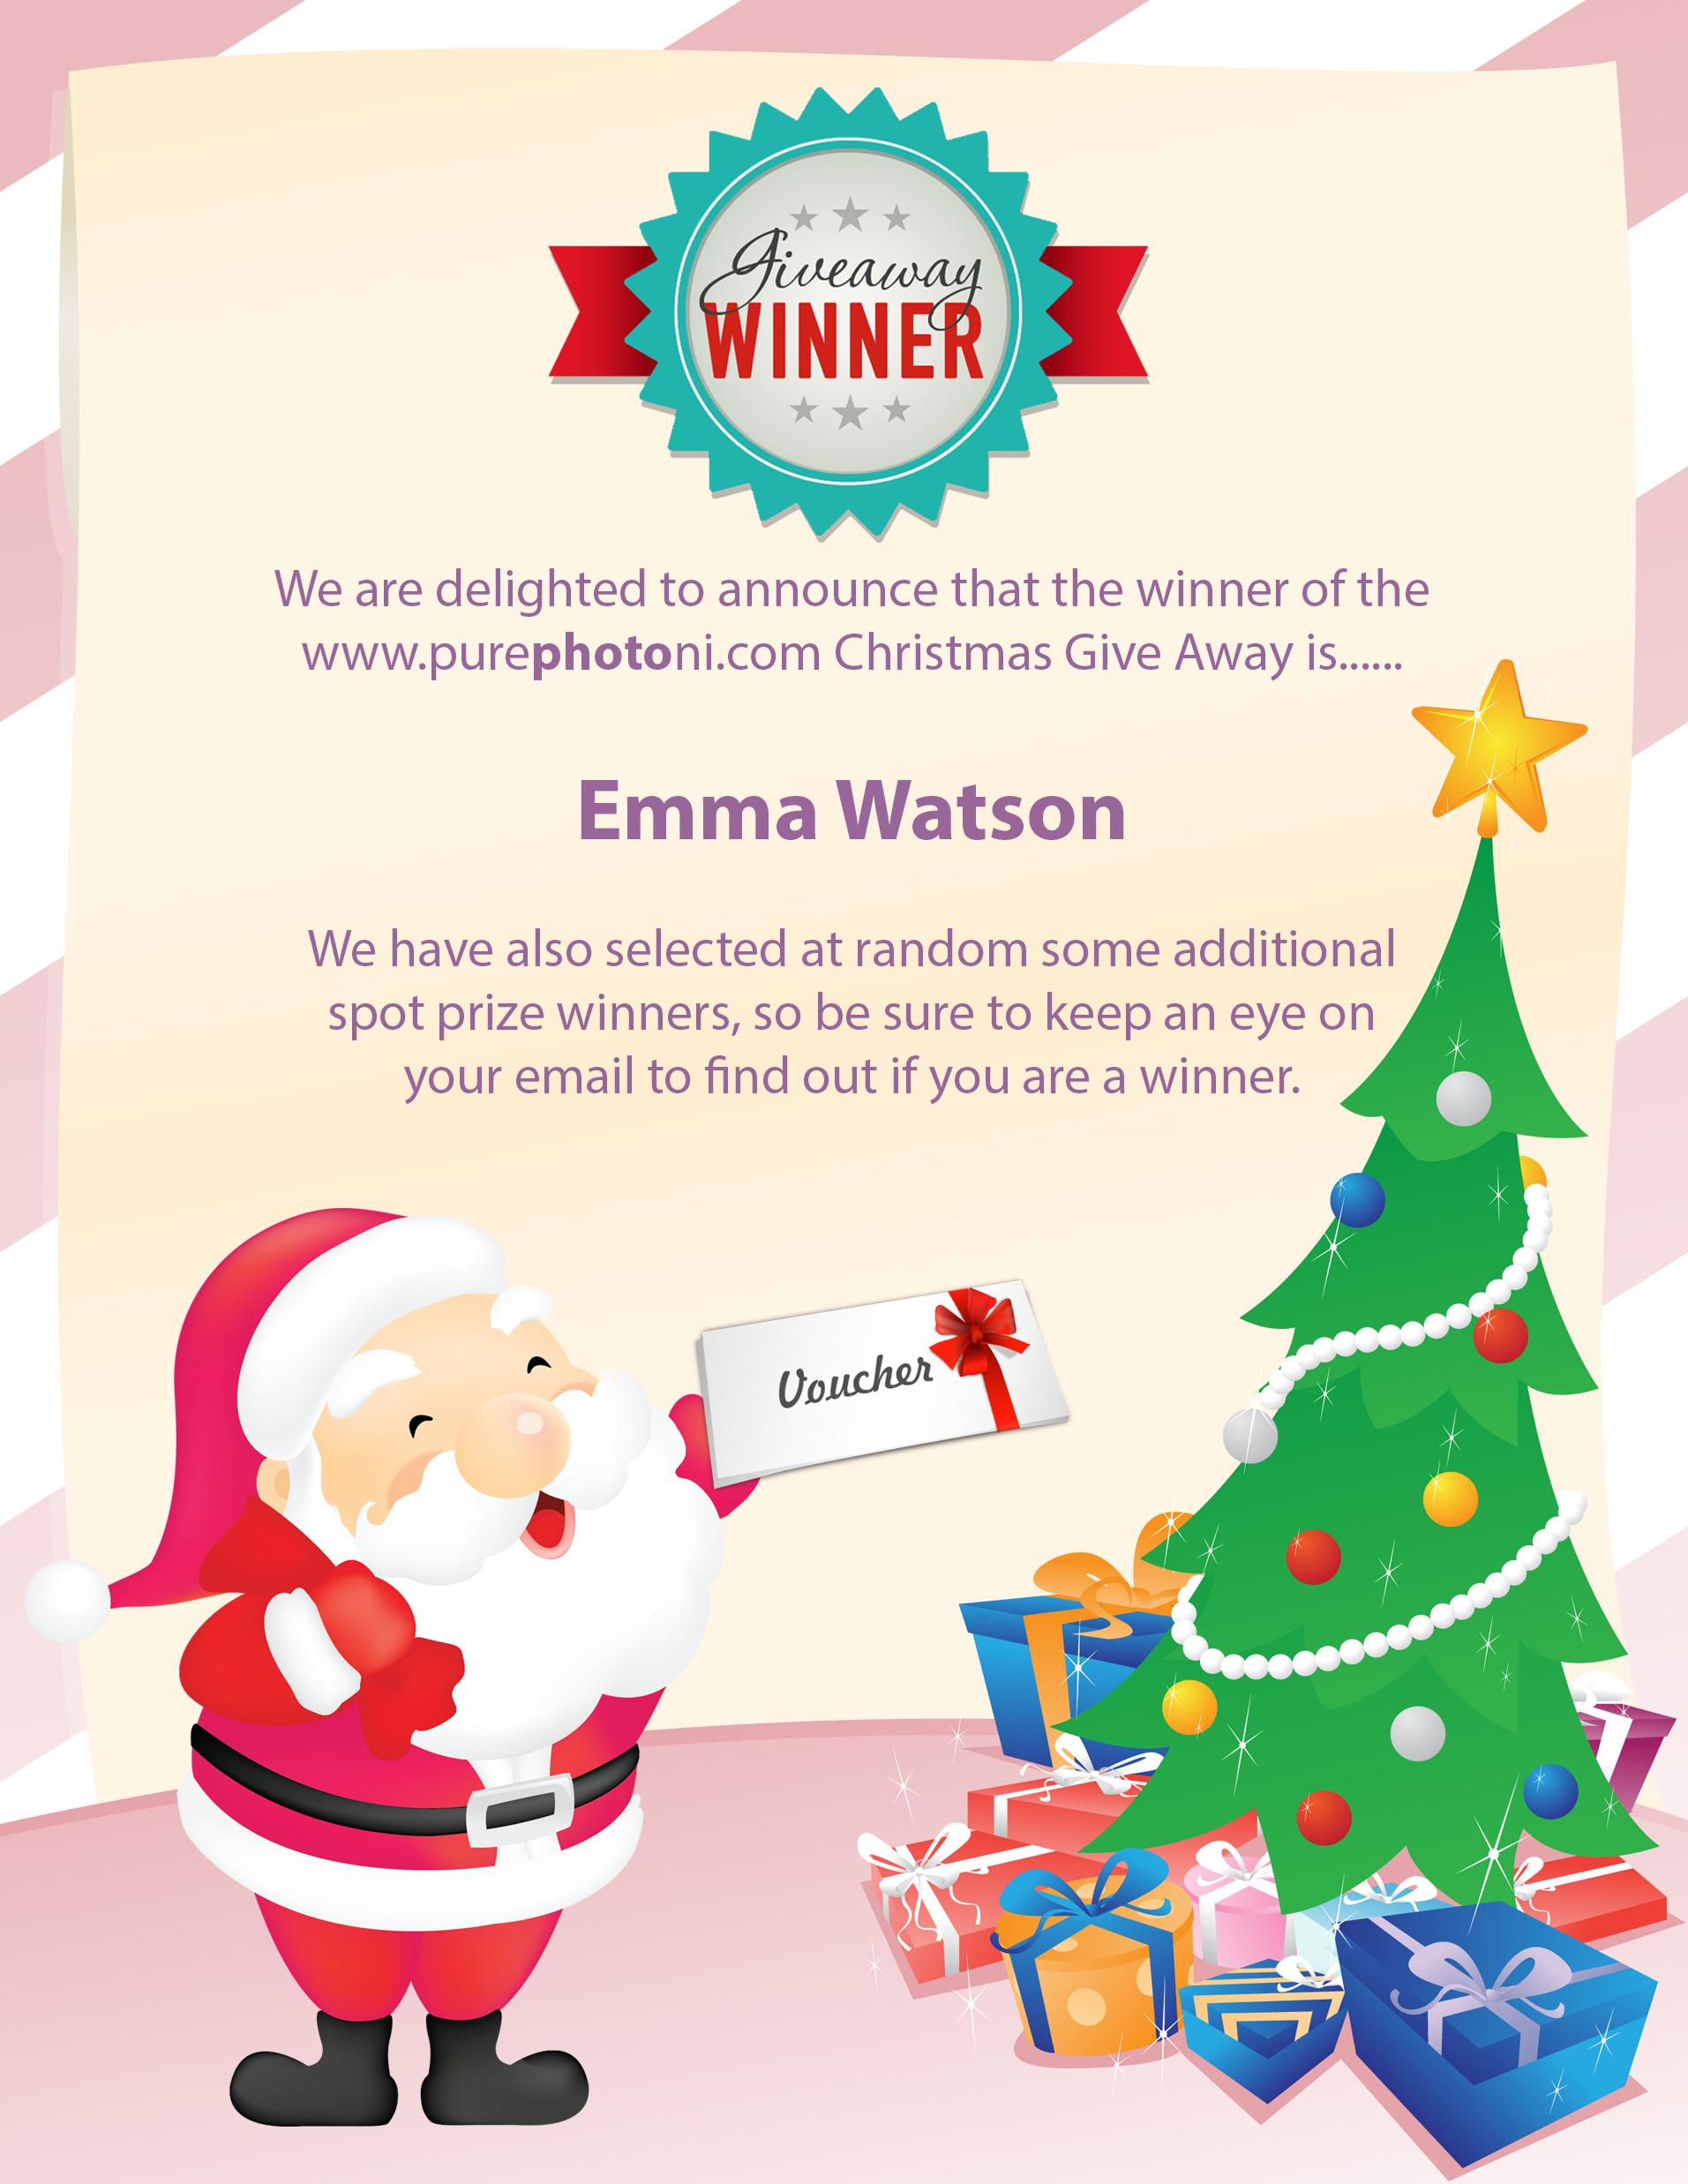 Congratulations to our winner Emma Watson.